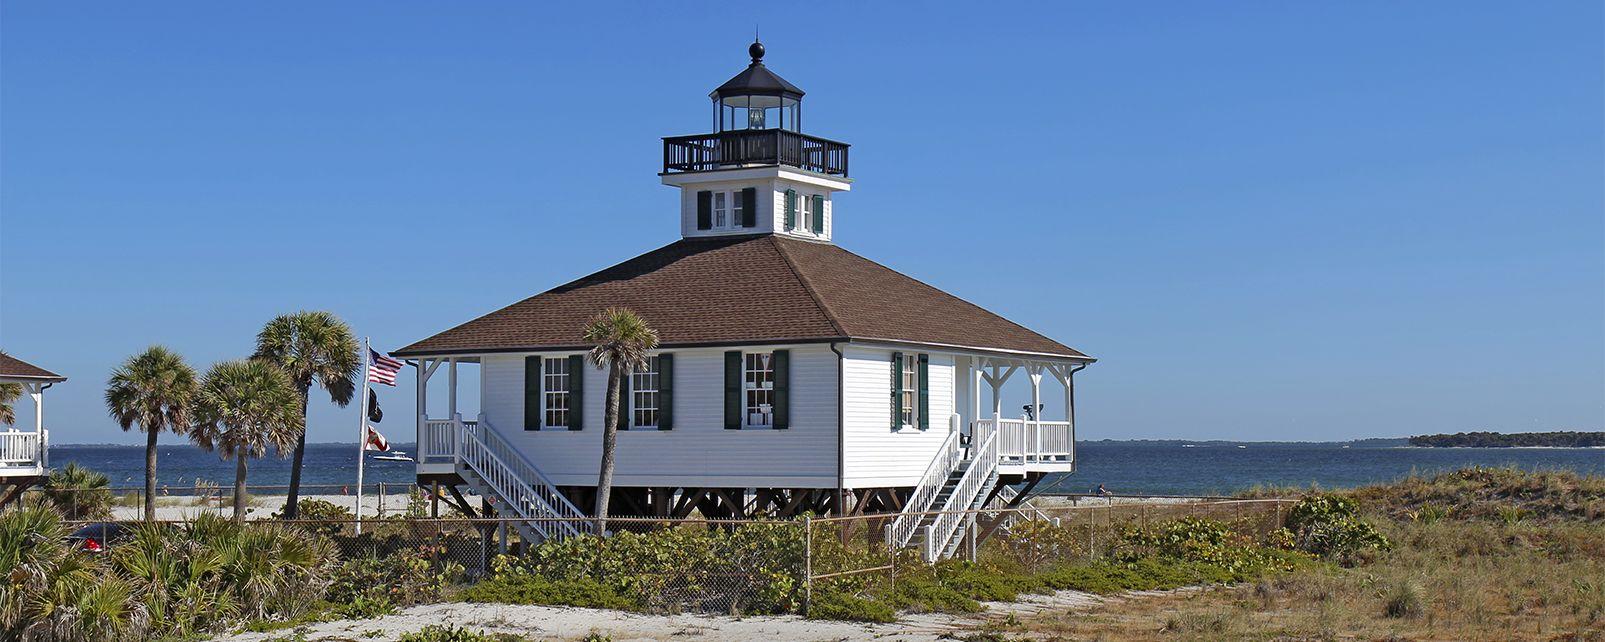 Pine Island and Cayo Costa , United States of America